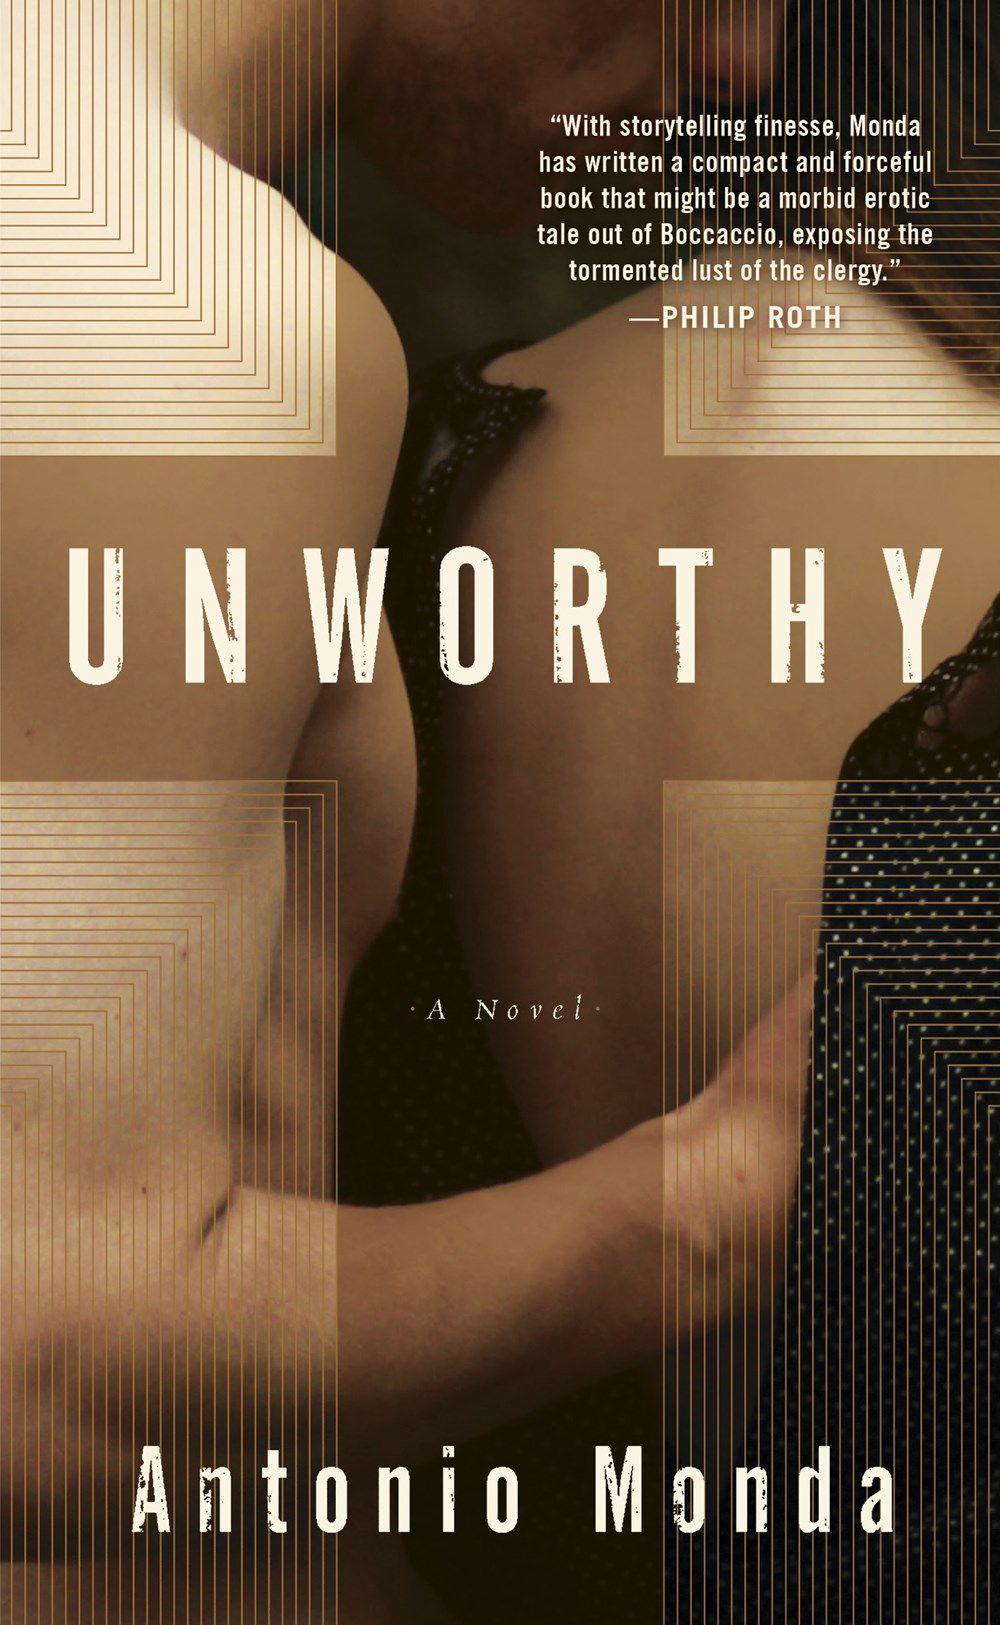 unworthy by antonio monda cover